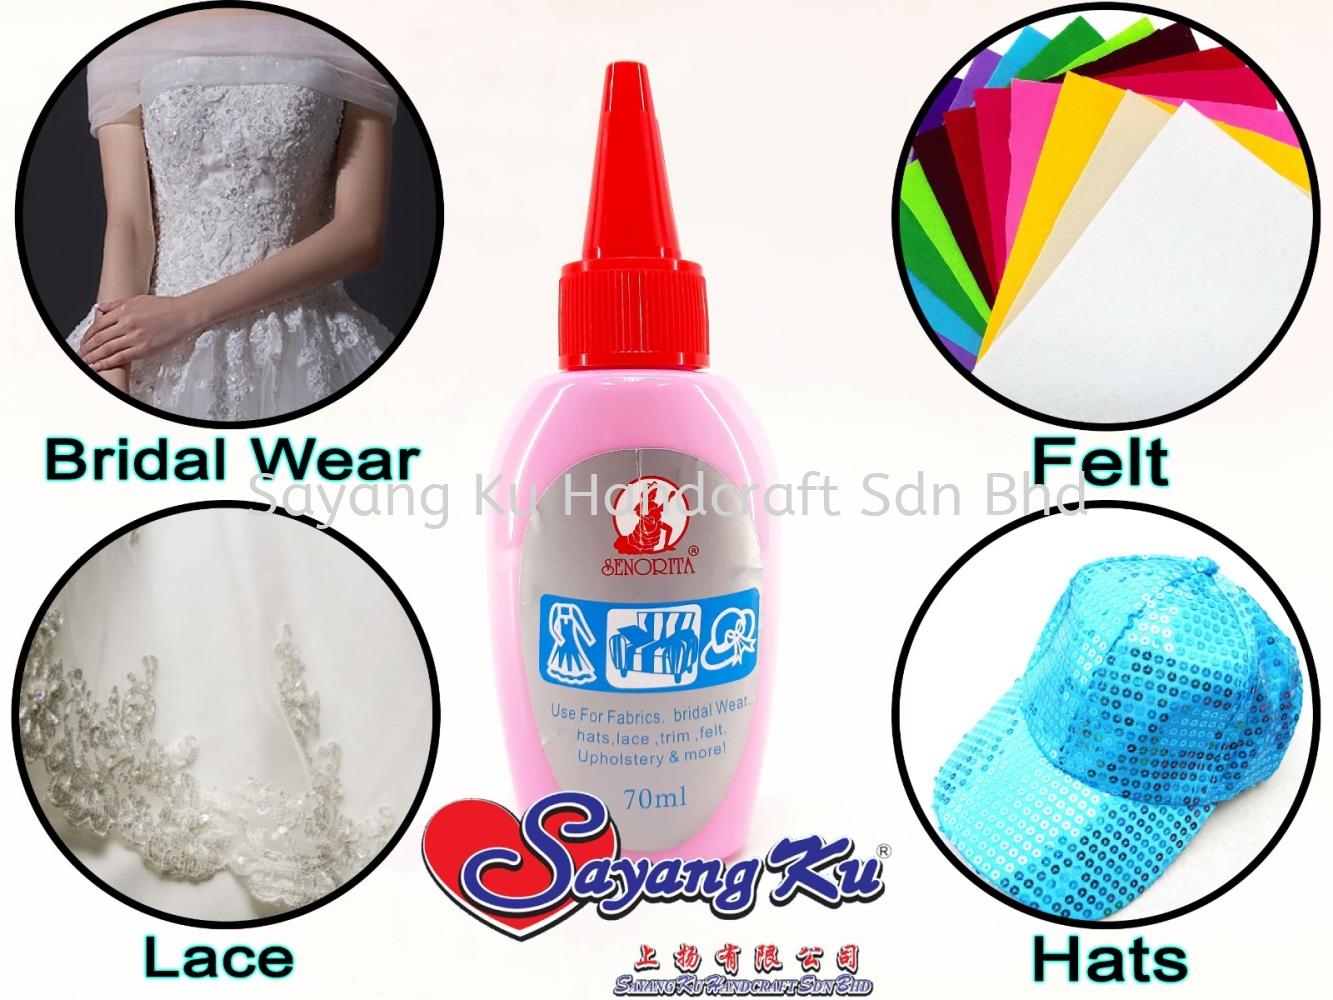 70ml Fabric Glue / Gam Fabrik / Gam kain